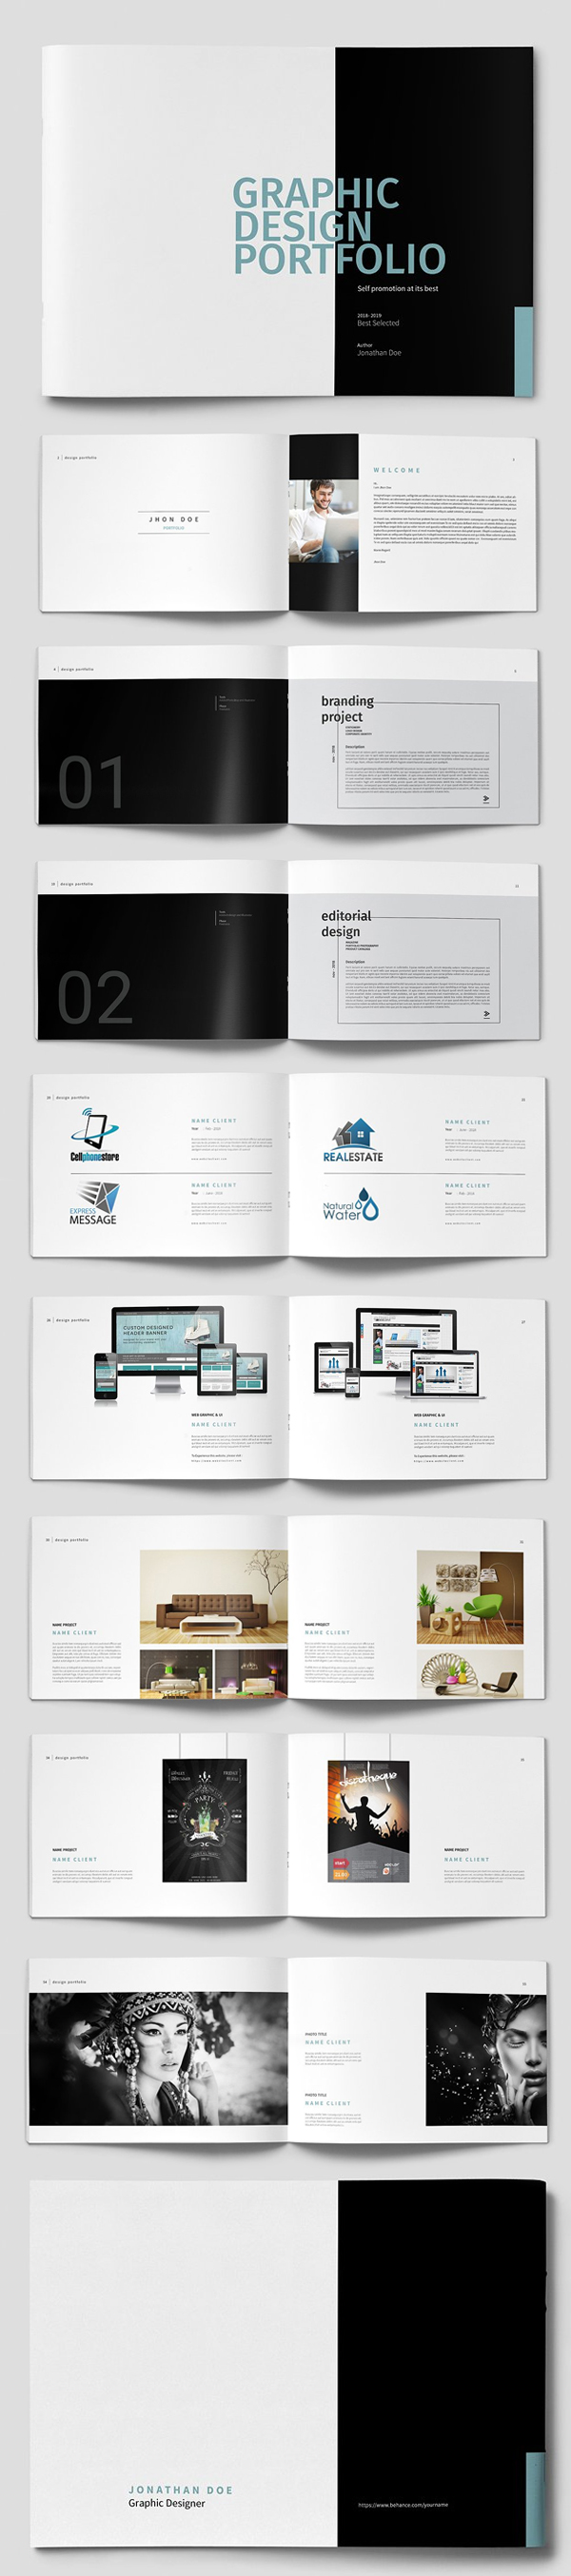 100 Professional Corporate Brochure Templates - 45